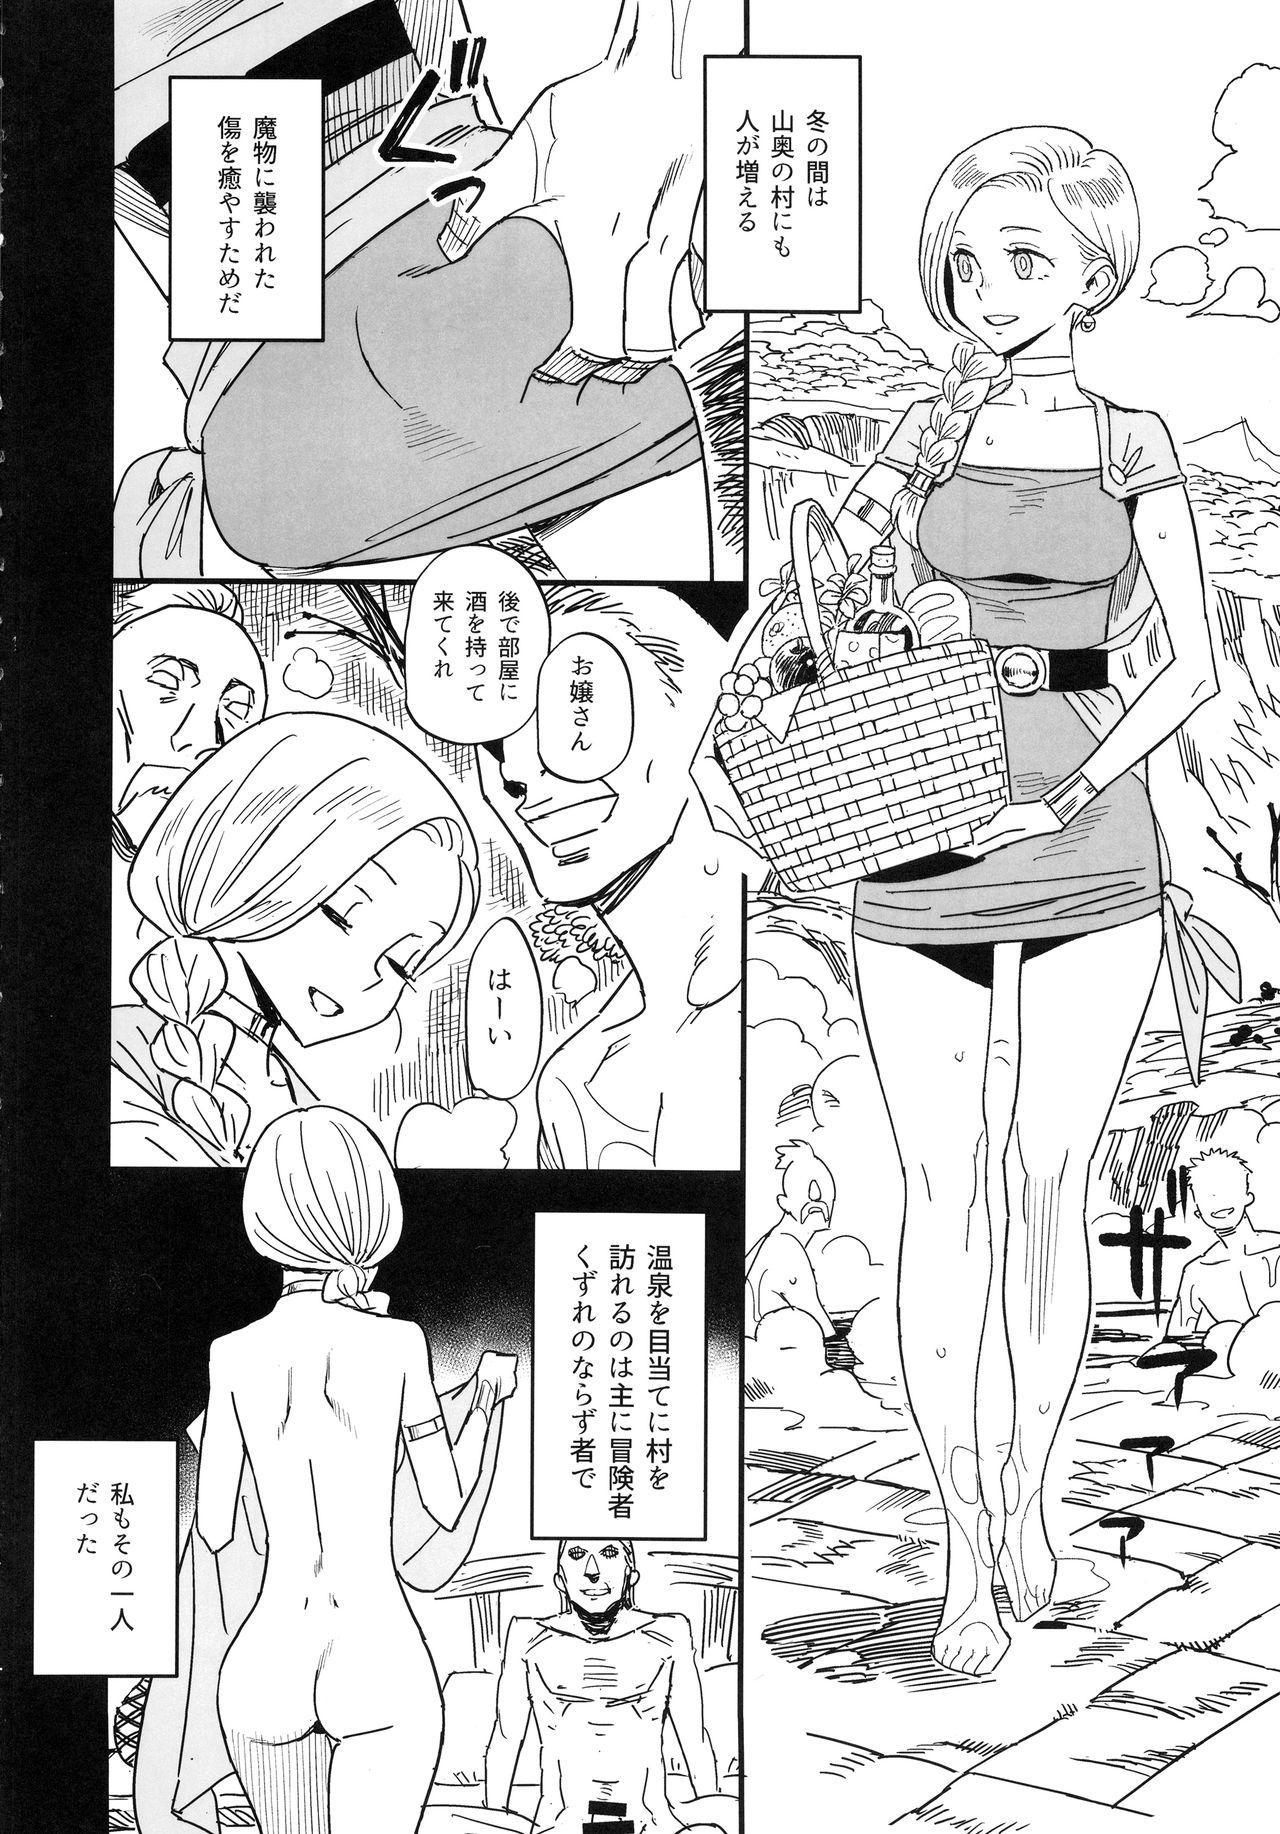 Mamono no Hanayome - Devil's Bride 2